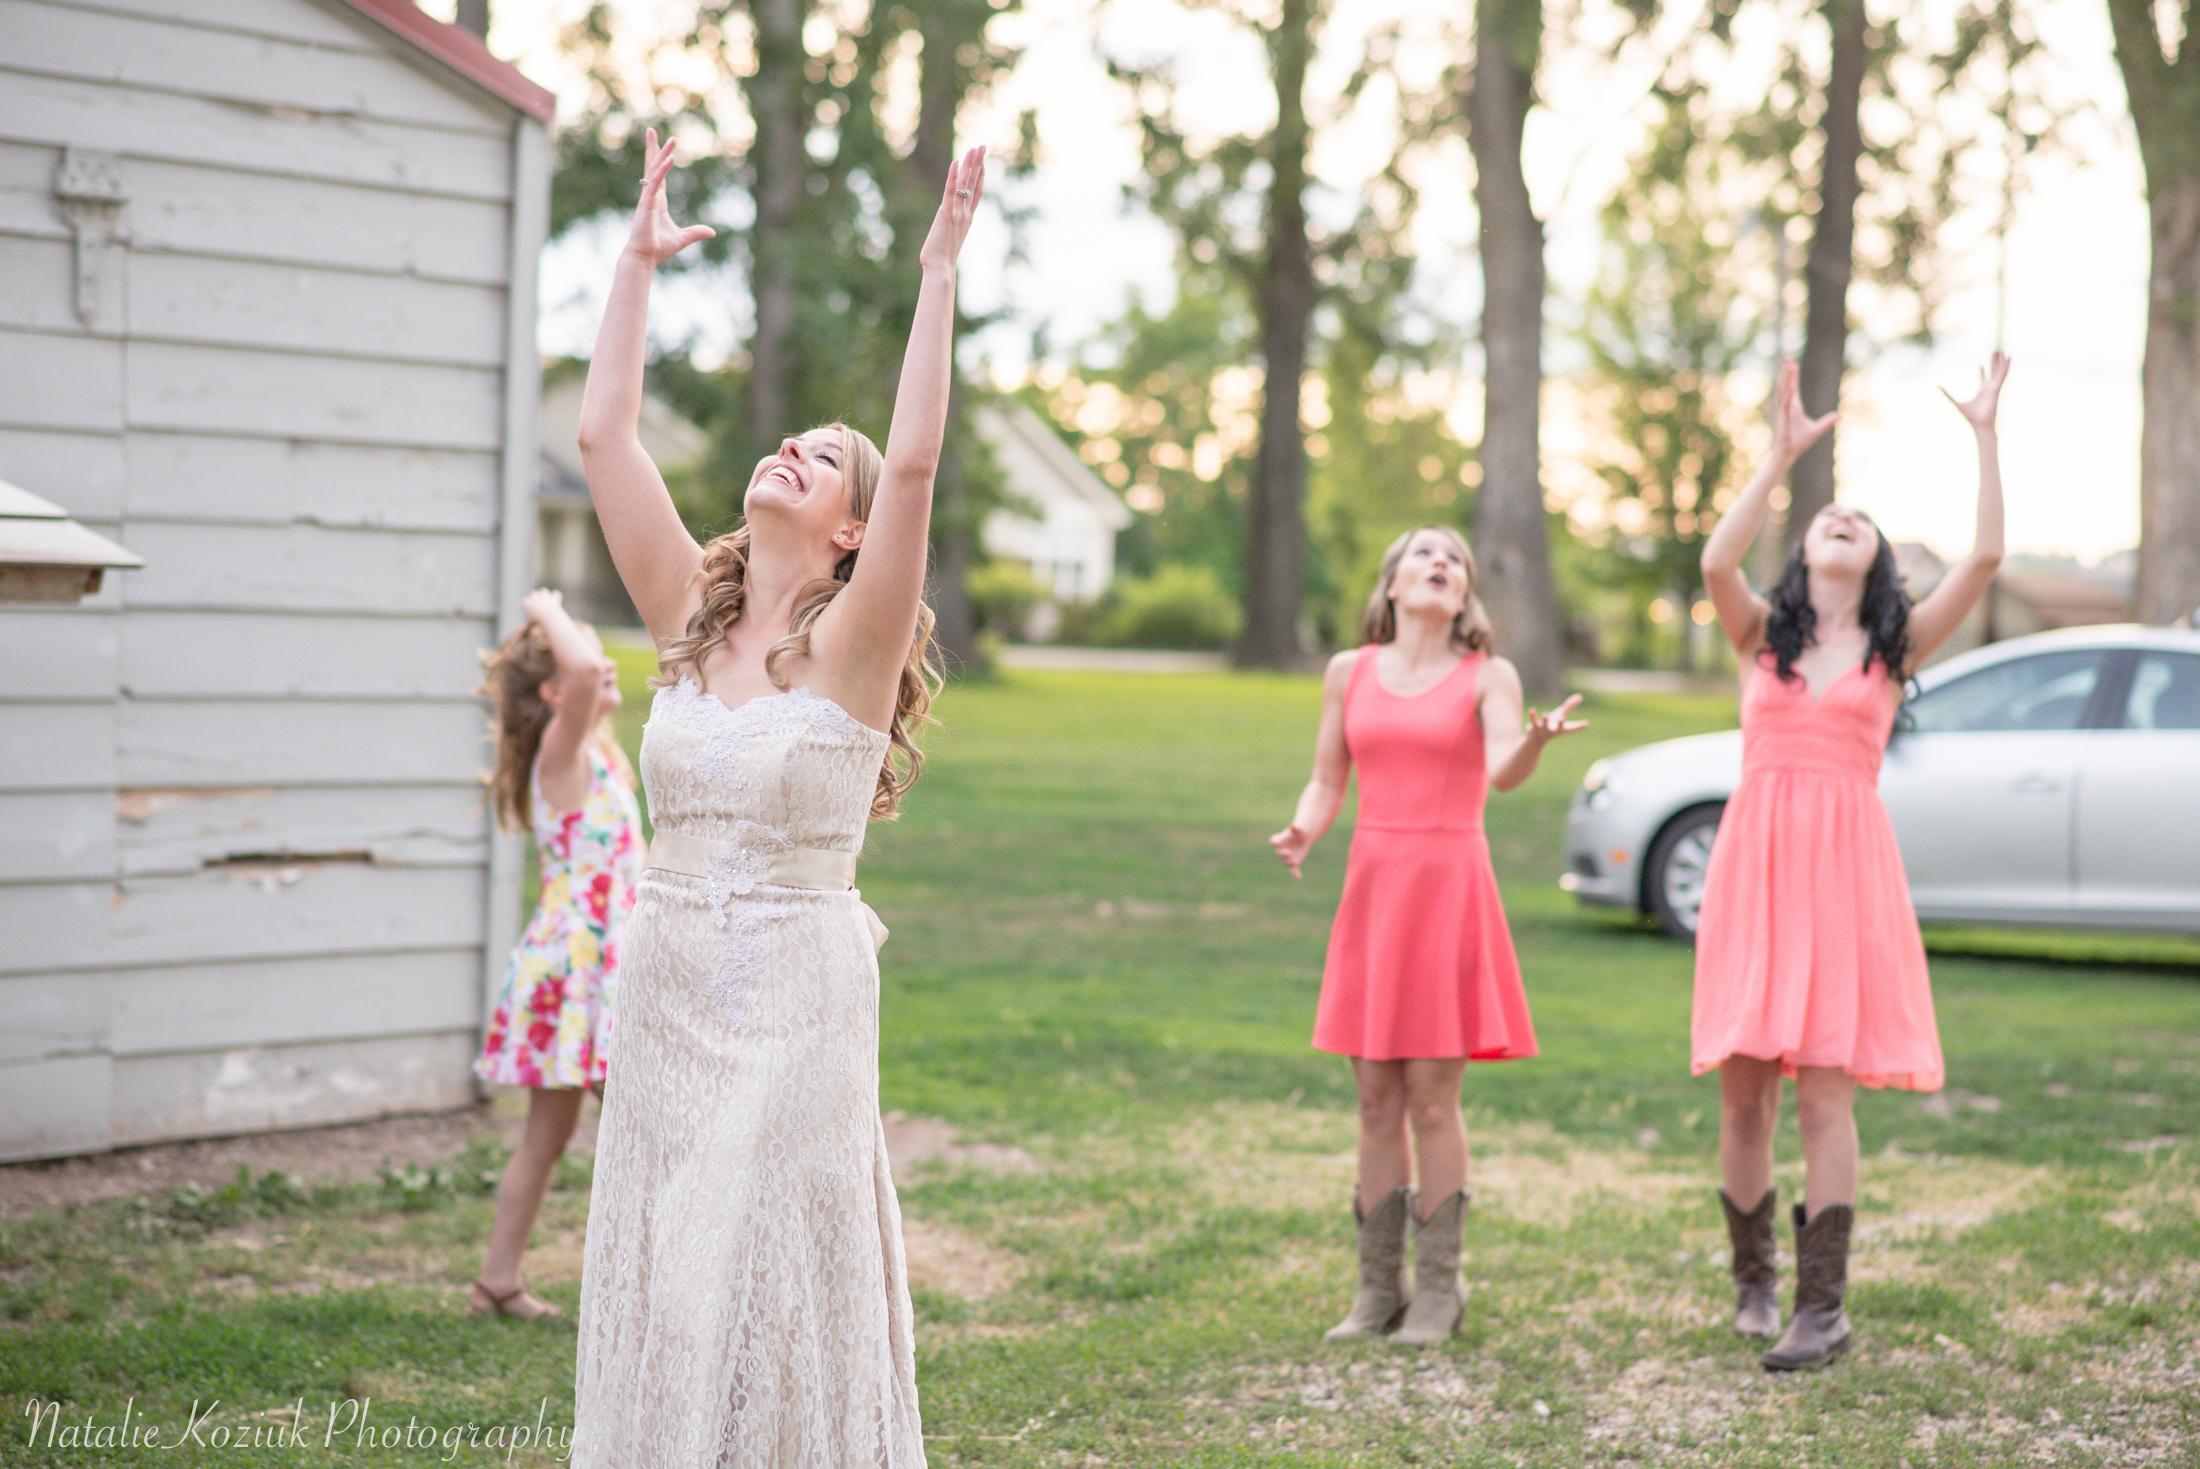 Natalie Koziuk Photography | Boise wedding photographer | reception | Star, ID | Bride Groom | nkoziukphotography.com